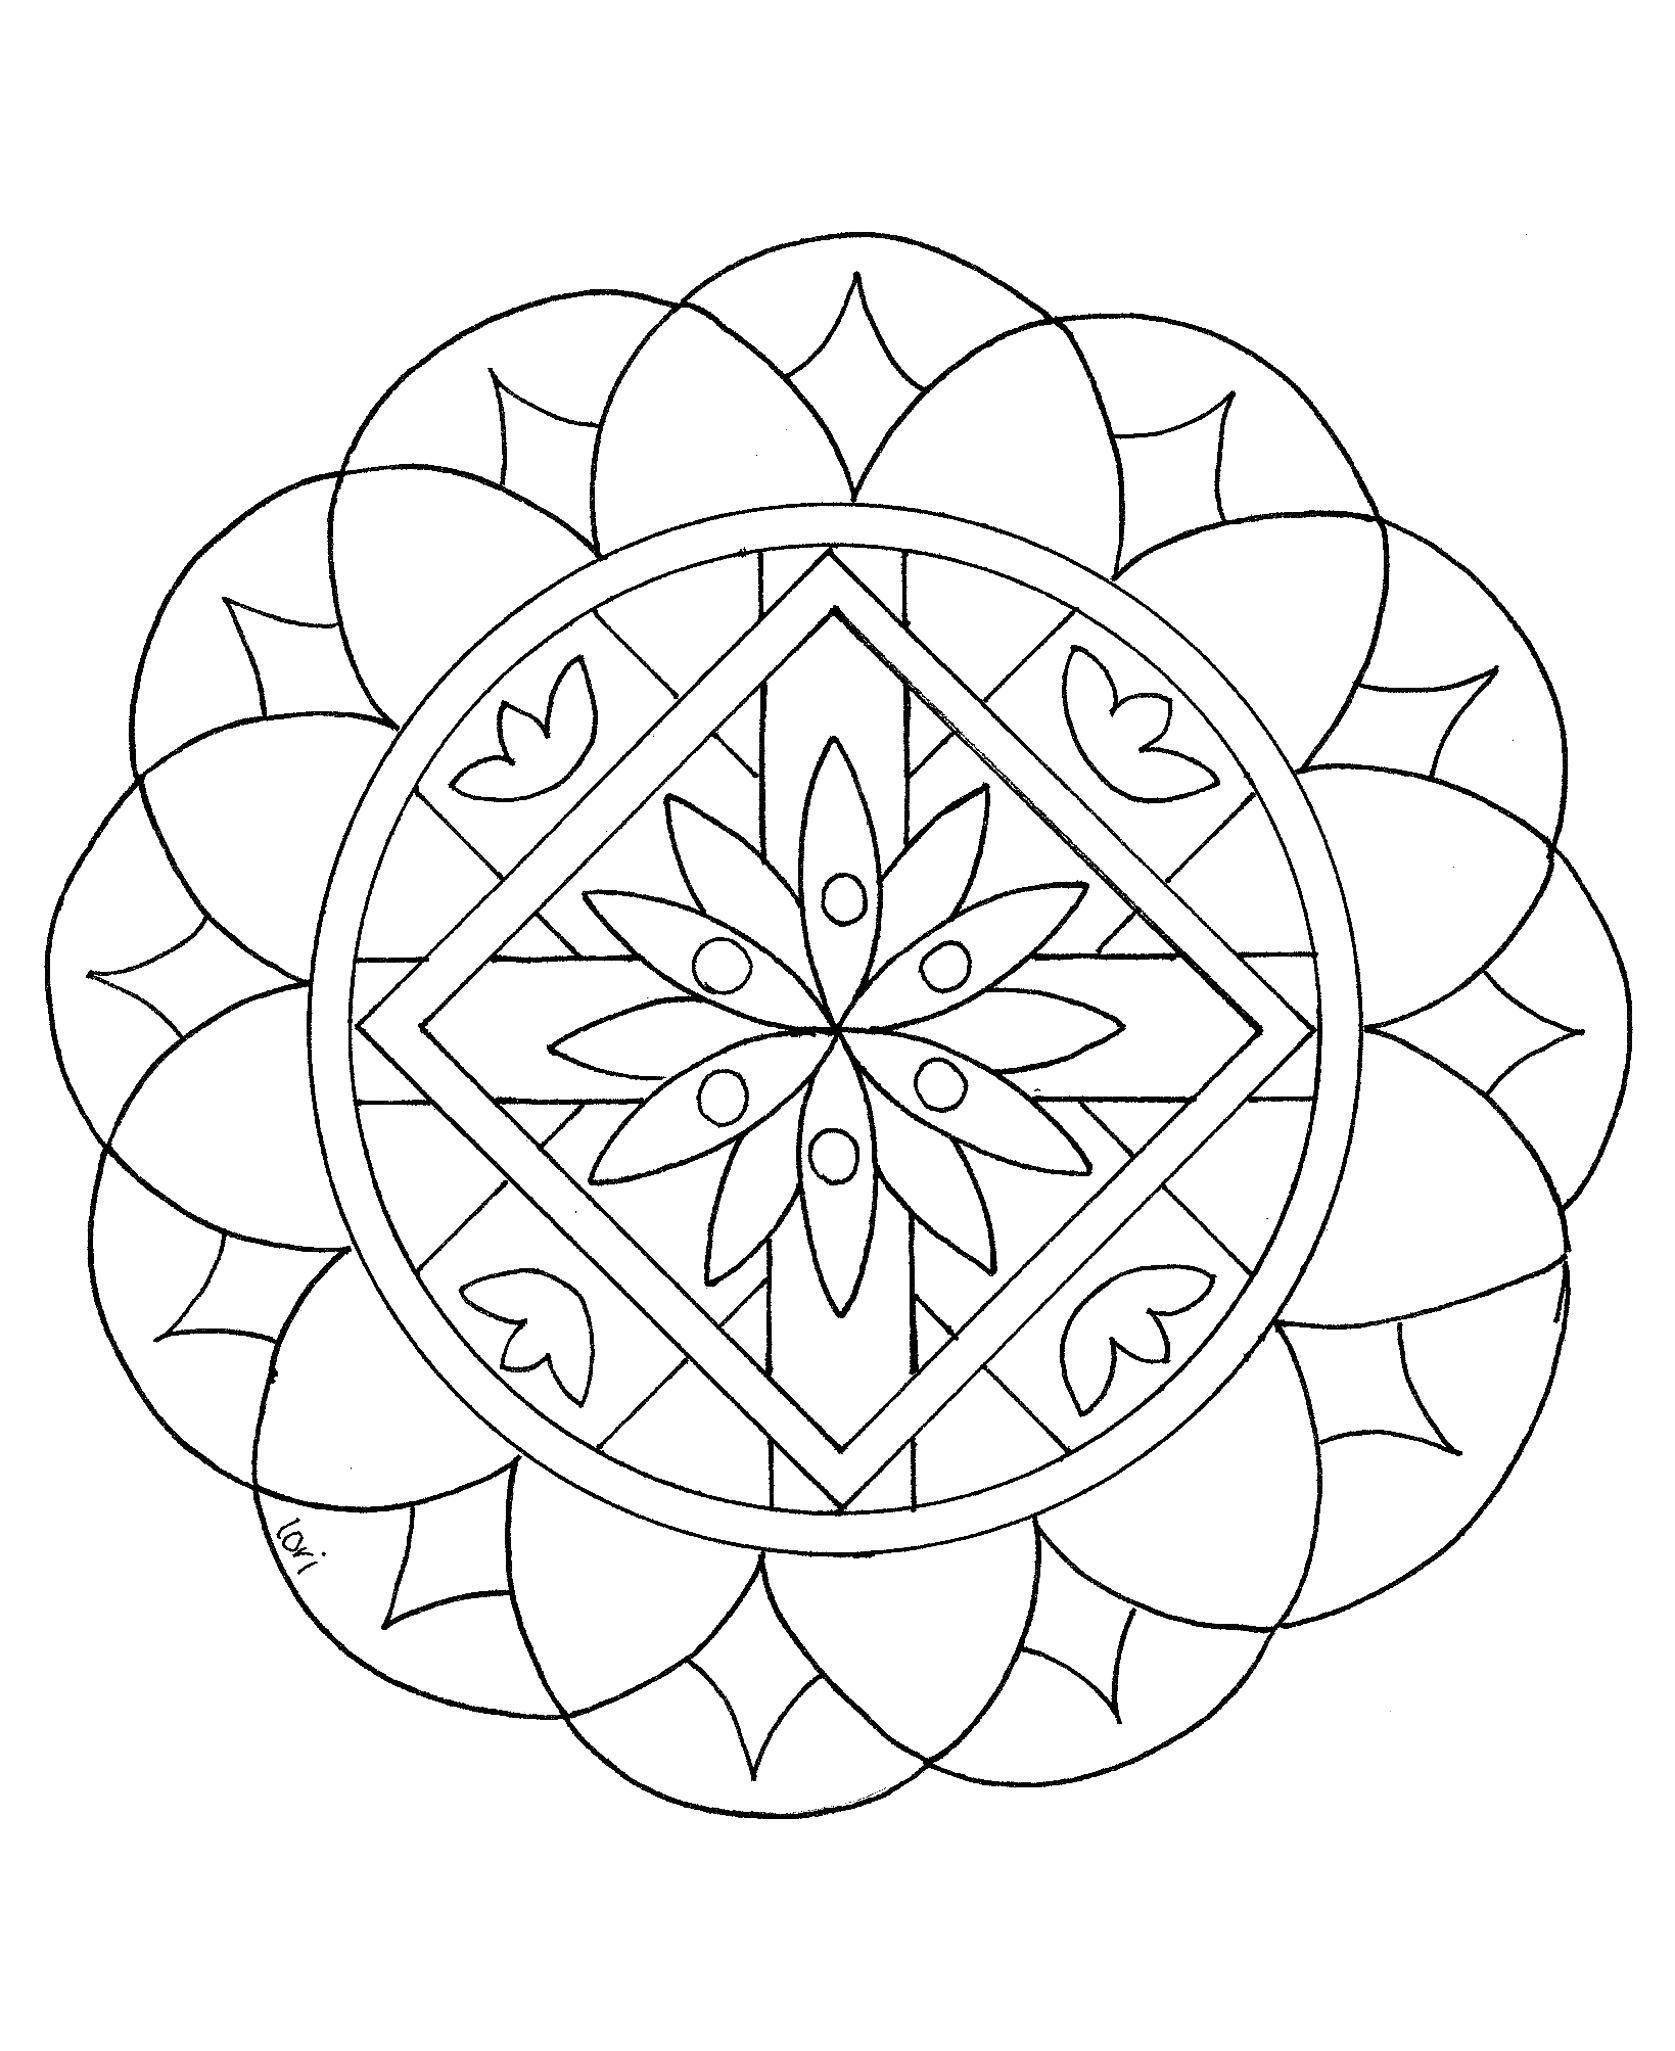 Easy mandalas for kids 100 mandalas zen anti stress for Simple geometric designs coloring pages